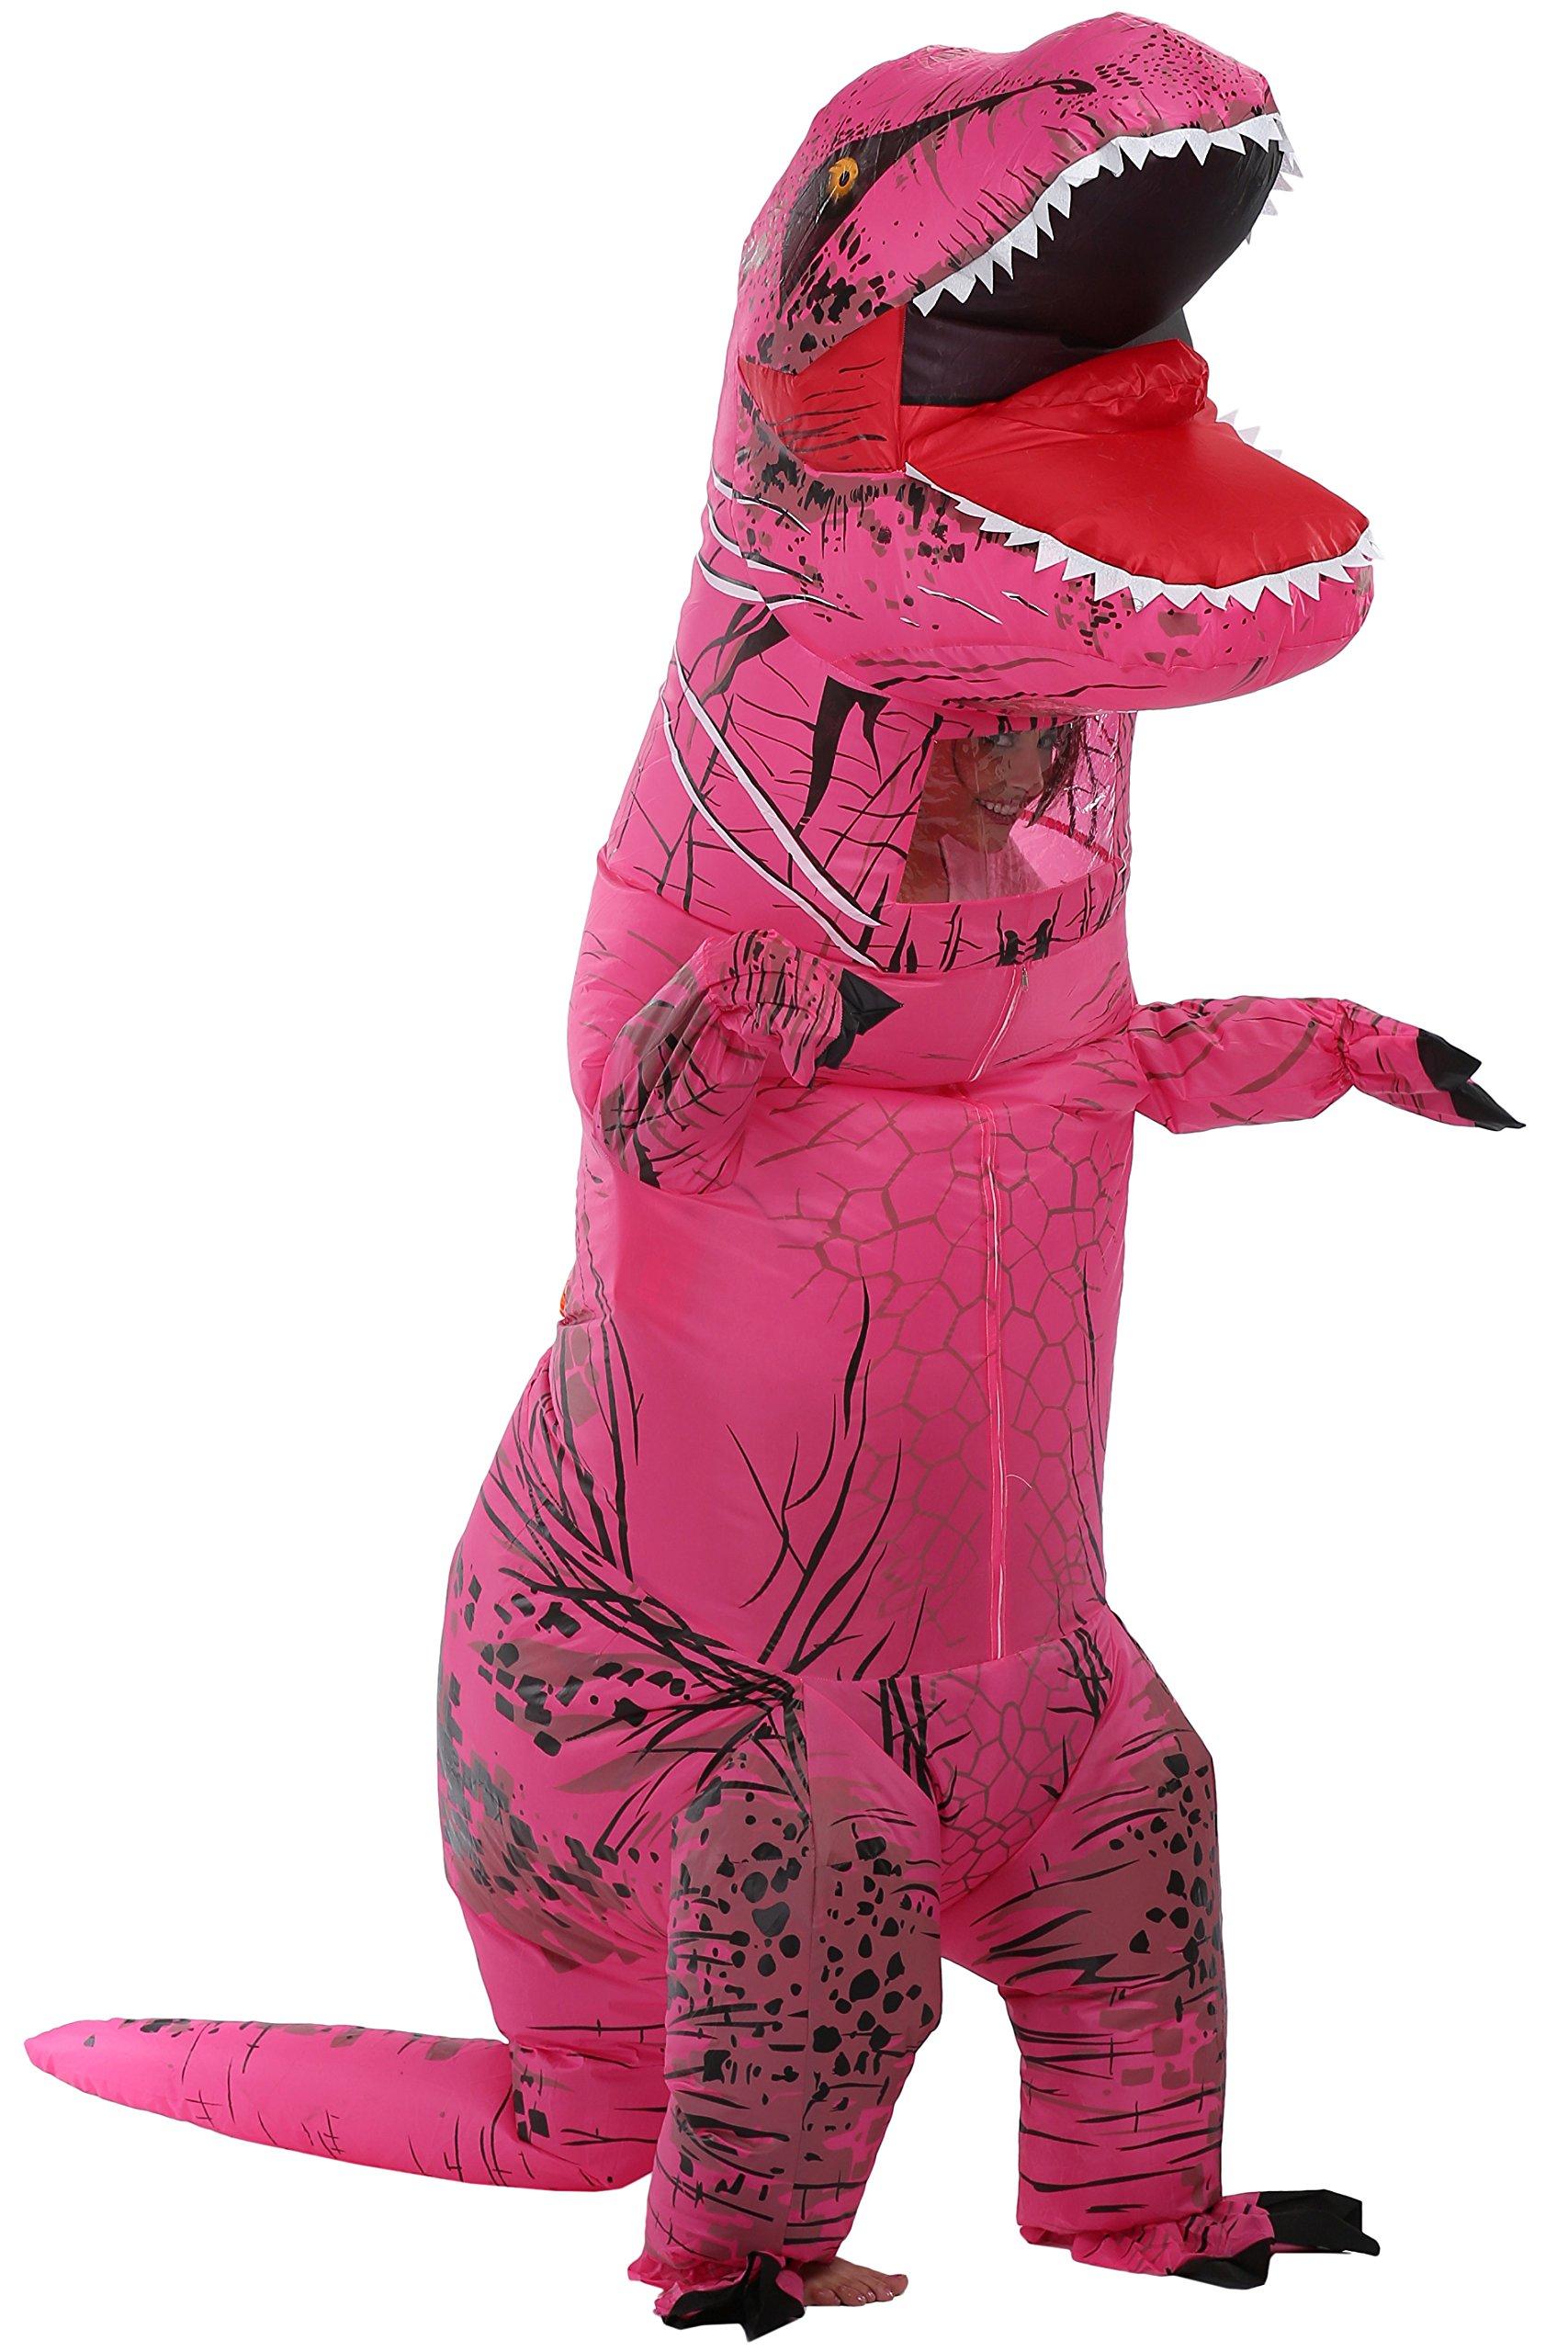 caringgarden Unisex Jurassic T-Rex Inflatable Costume Dinosaur Fancy Dress Hot Pink Adult Size